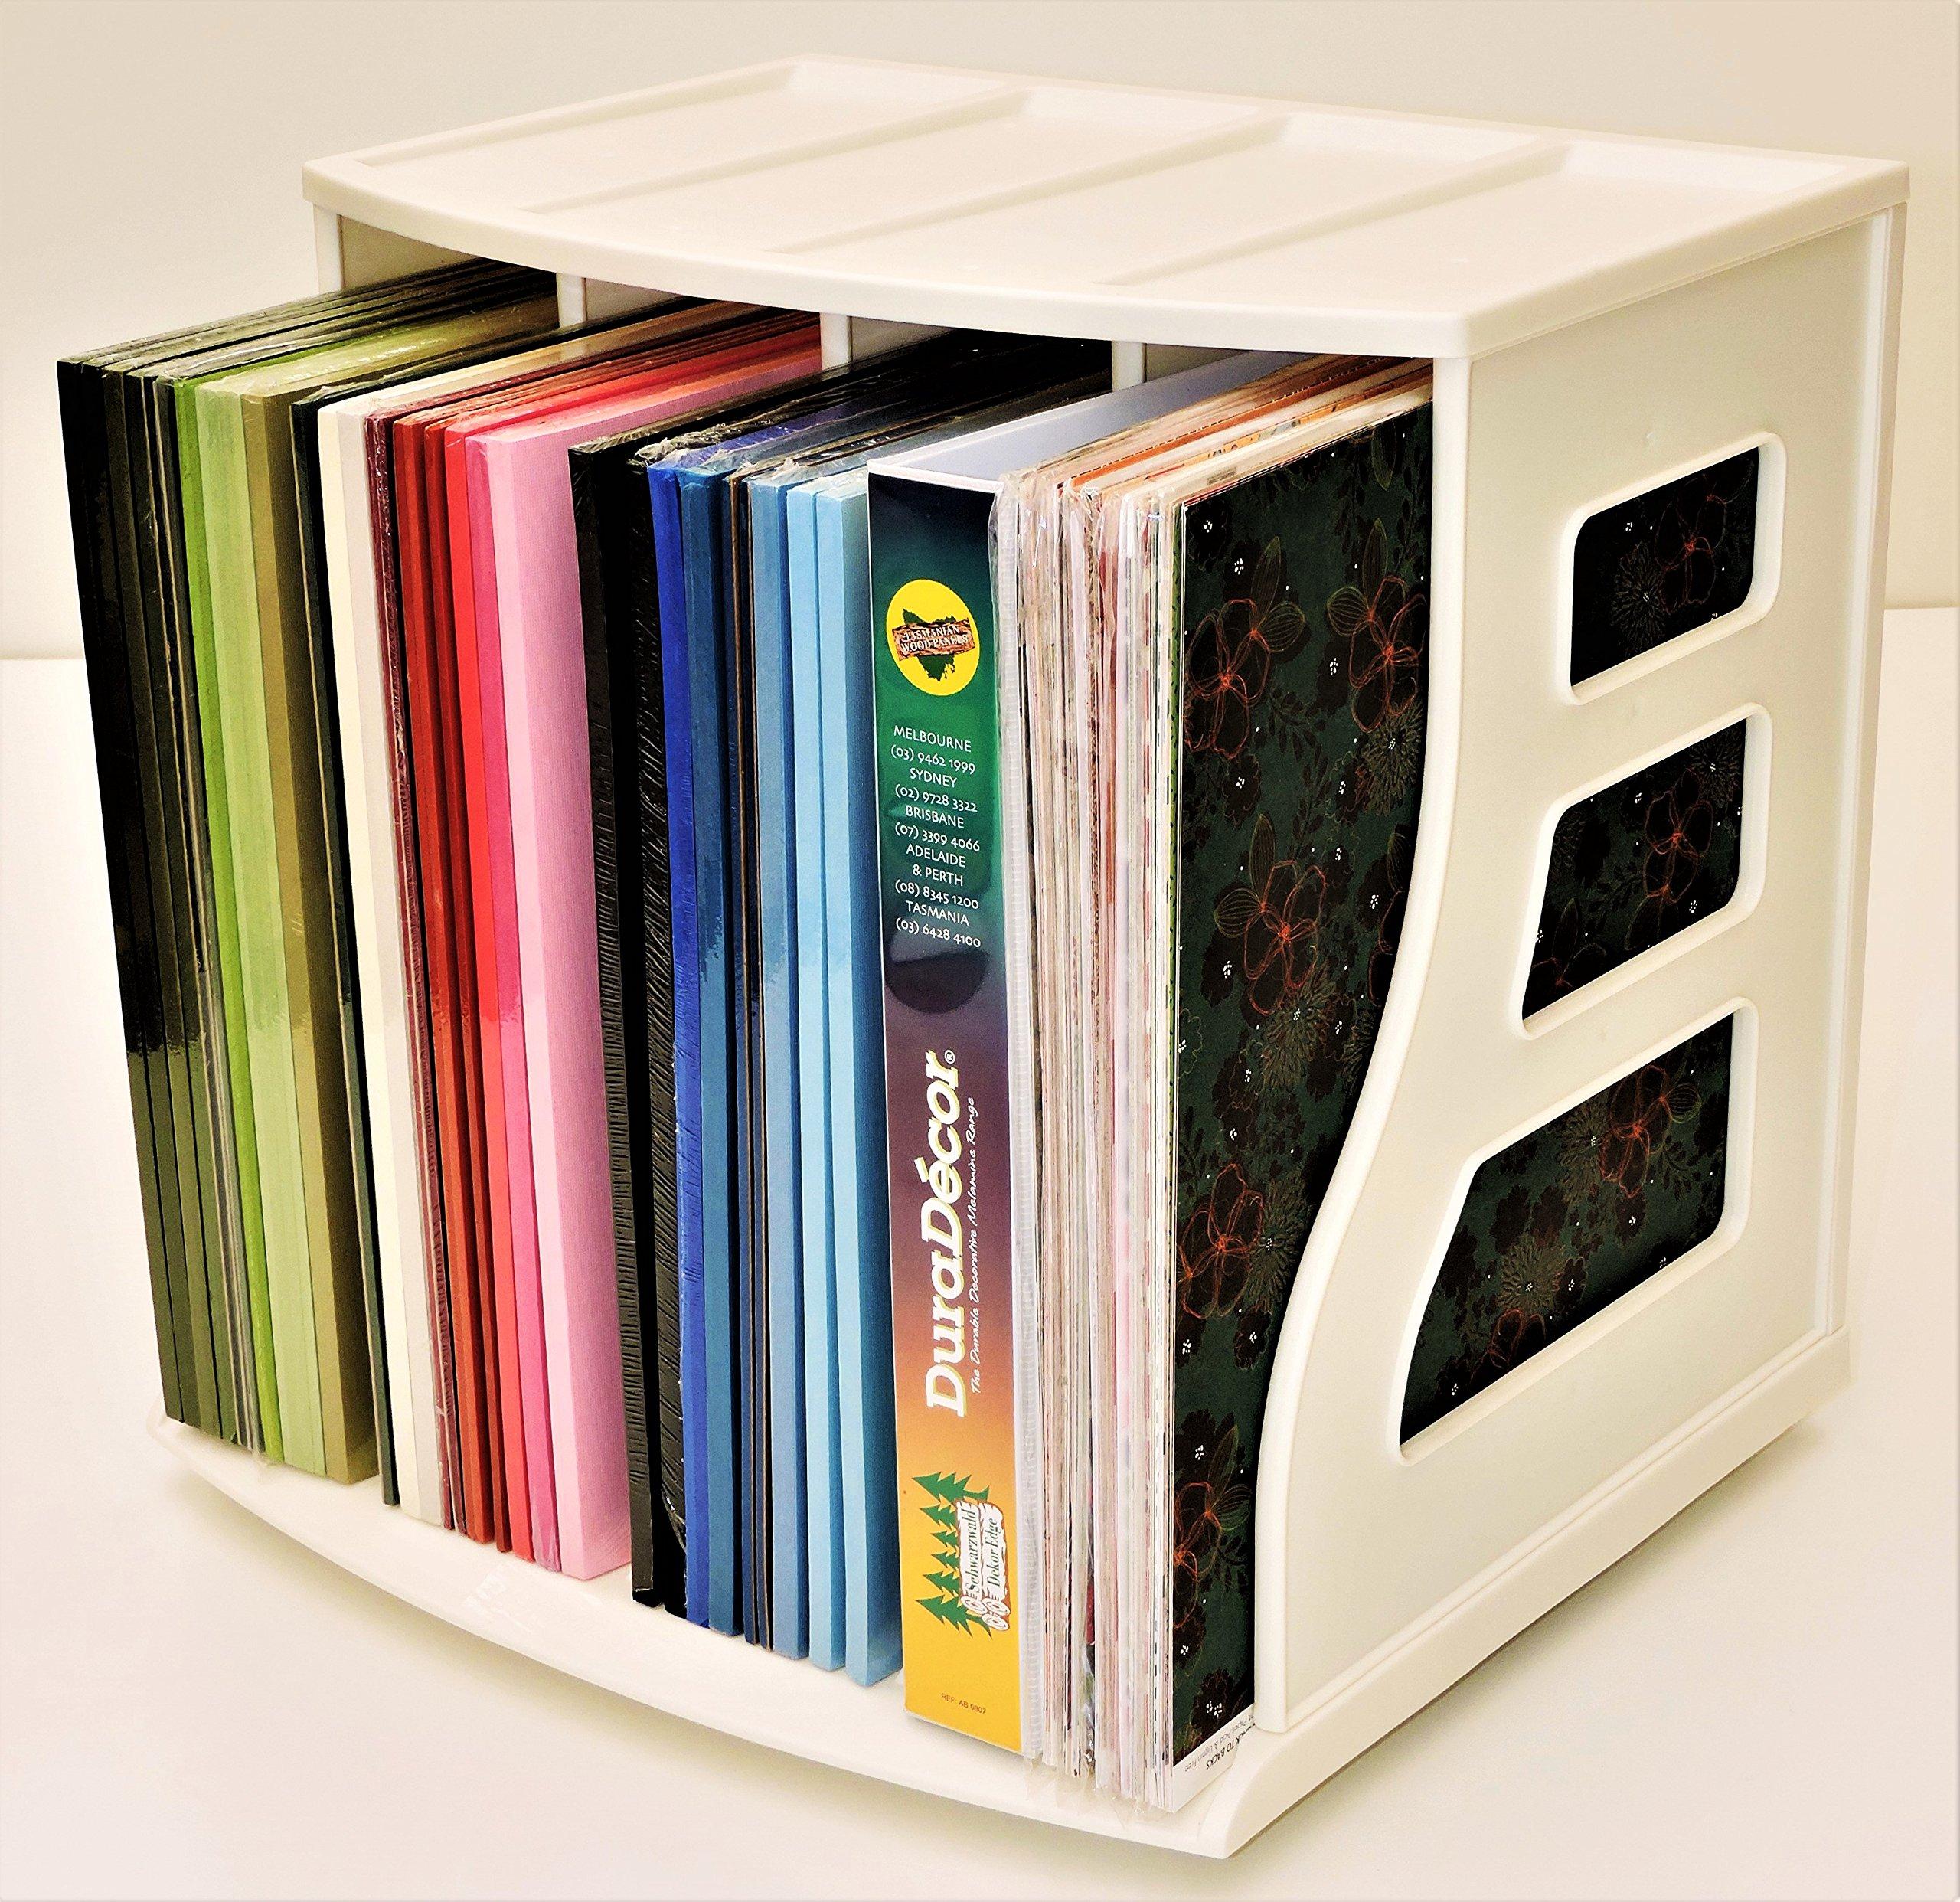 r vinyl storageconsole for comments shelf ikea console setupikea record eket storage